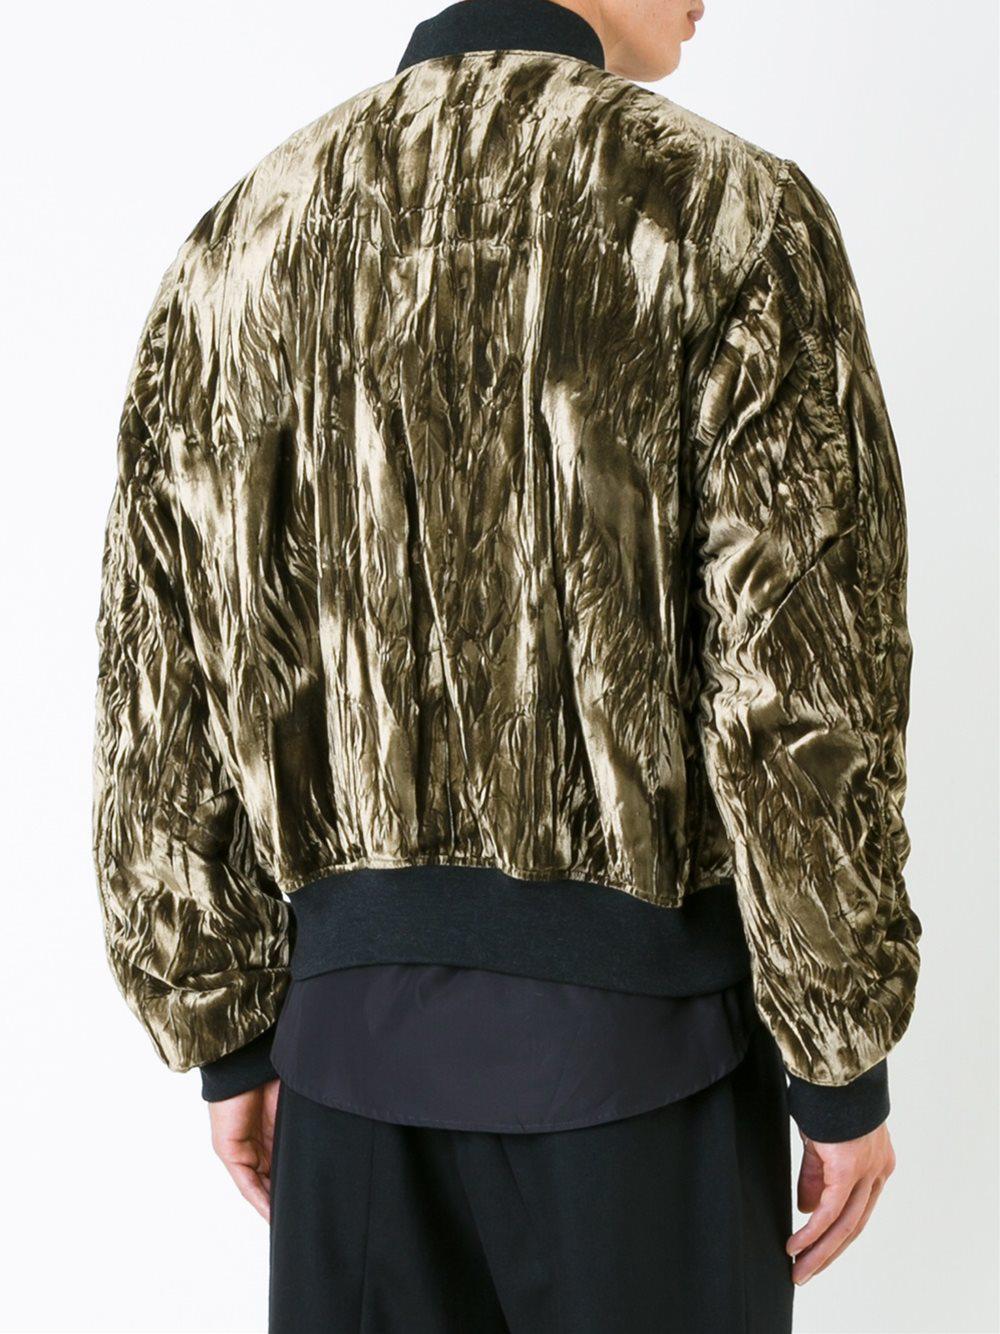 Haider Ackermann 'madame' Jacket in Metallic for Men